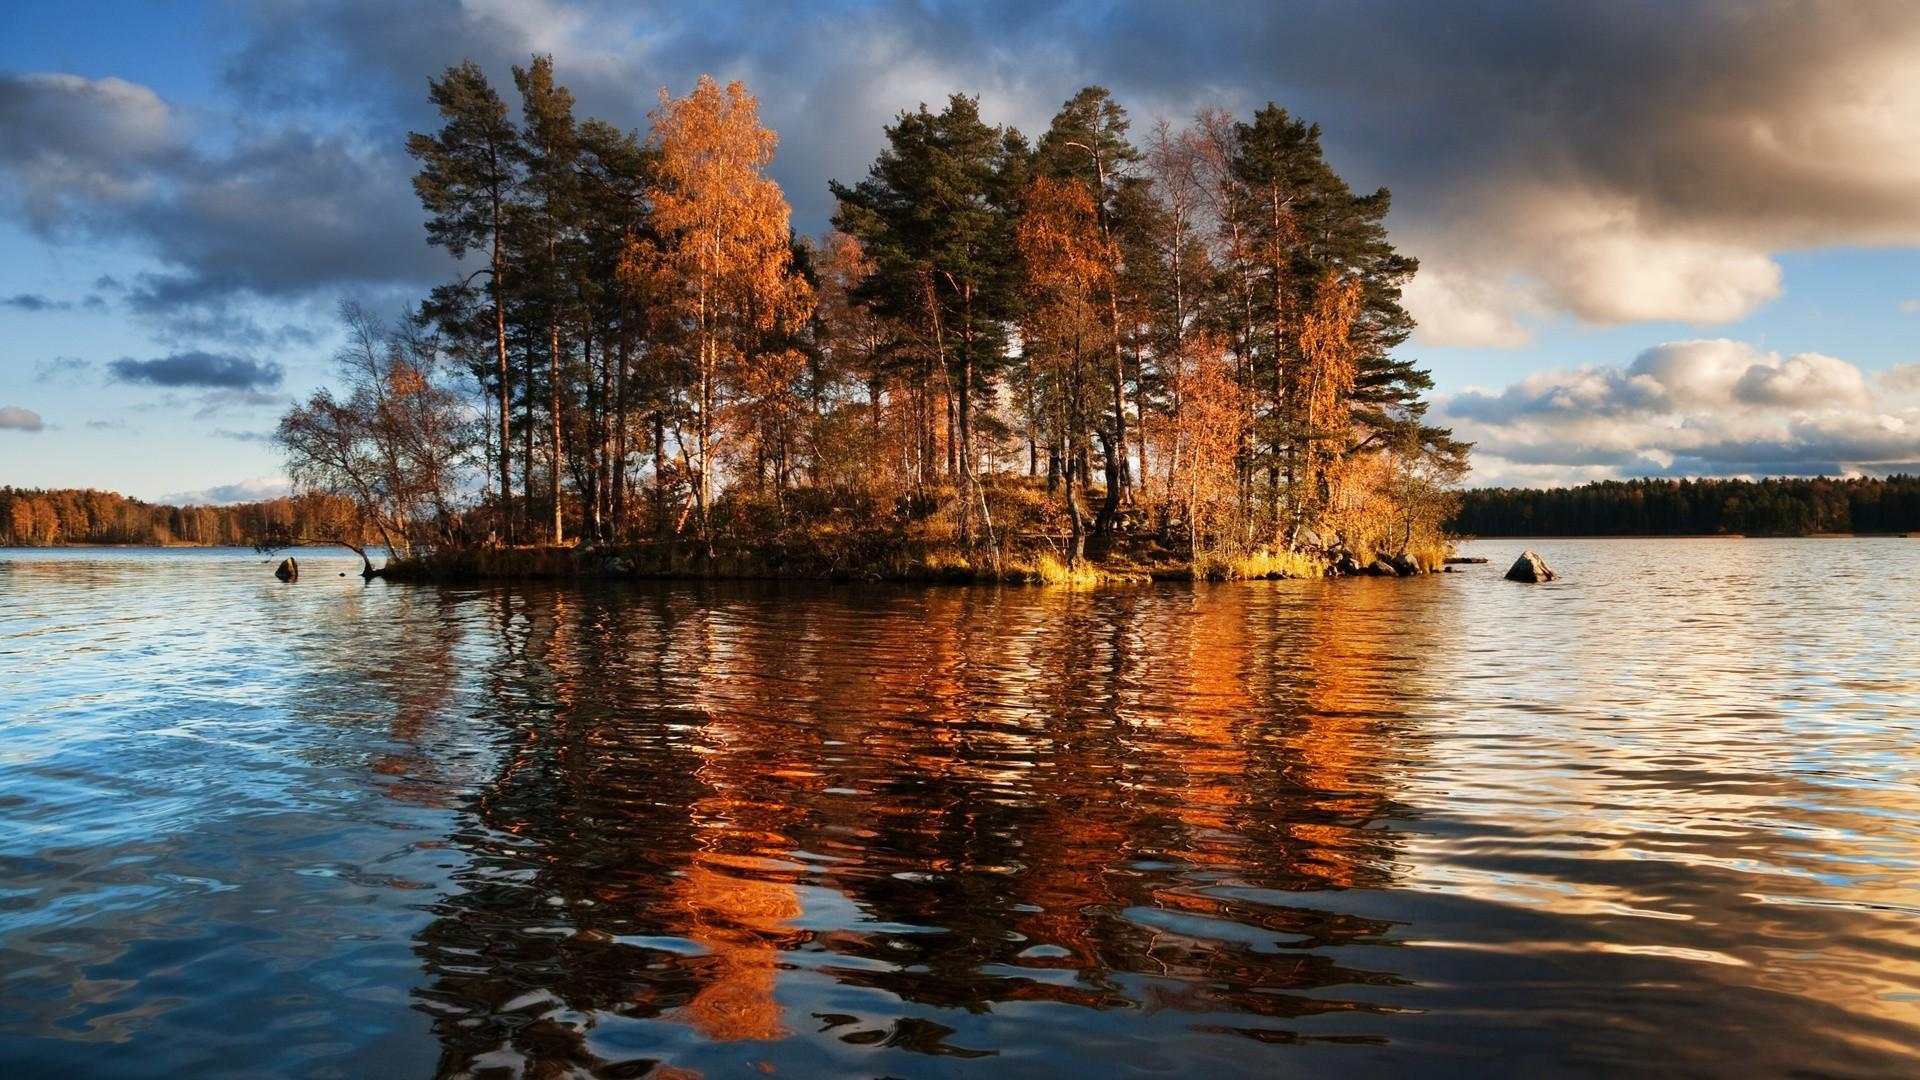 Lake trees autumn fall reflection wallpaper | | 117633 .